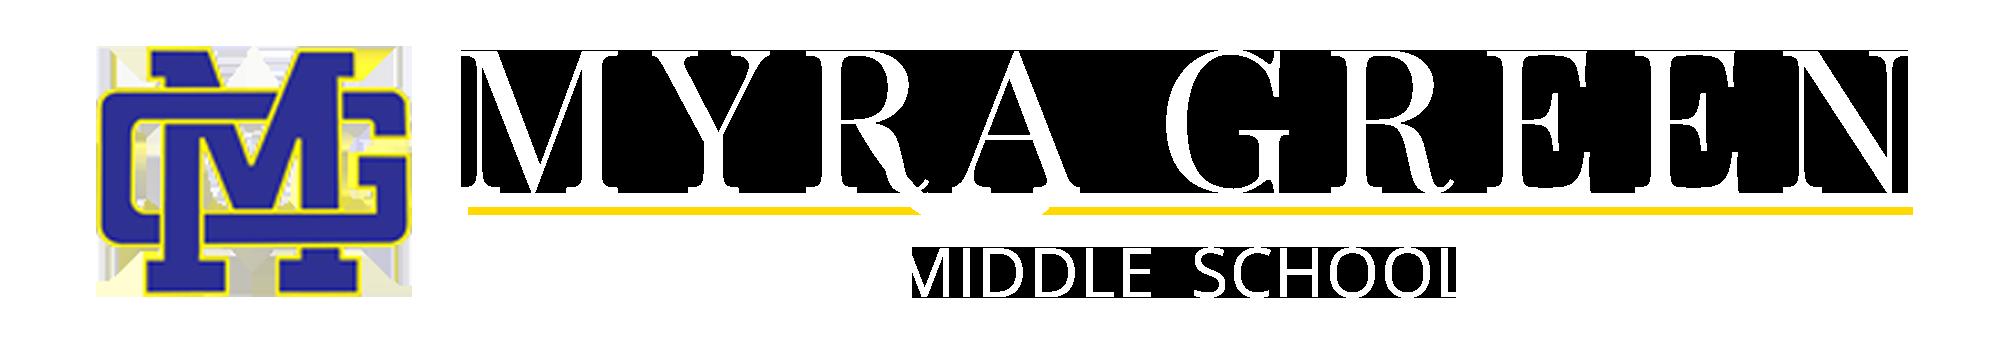 Myra Green Middle School Logo